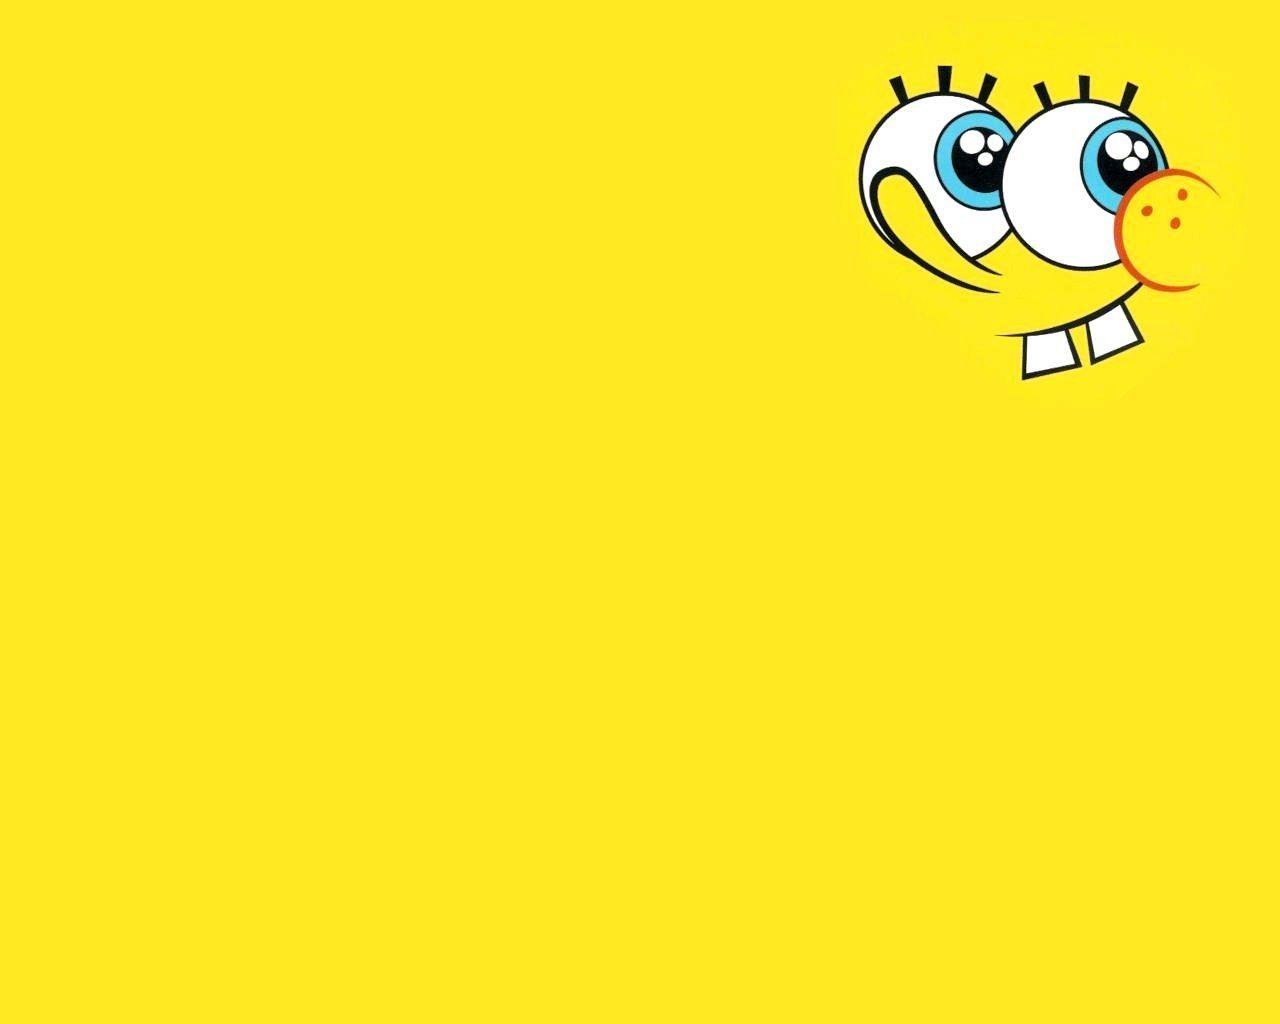 Pin By Siti Harlina On Yellow Spongebob Wallpaper Spongebob Background Doraemon Wallpapers